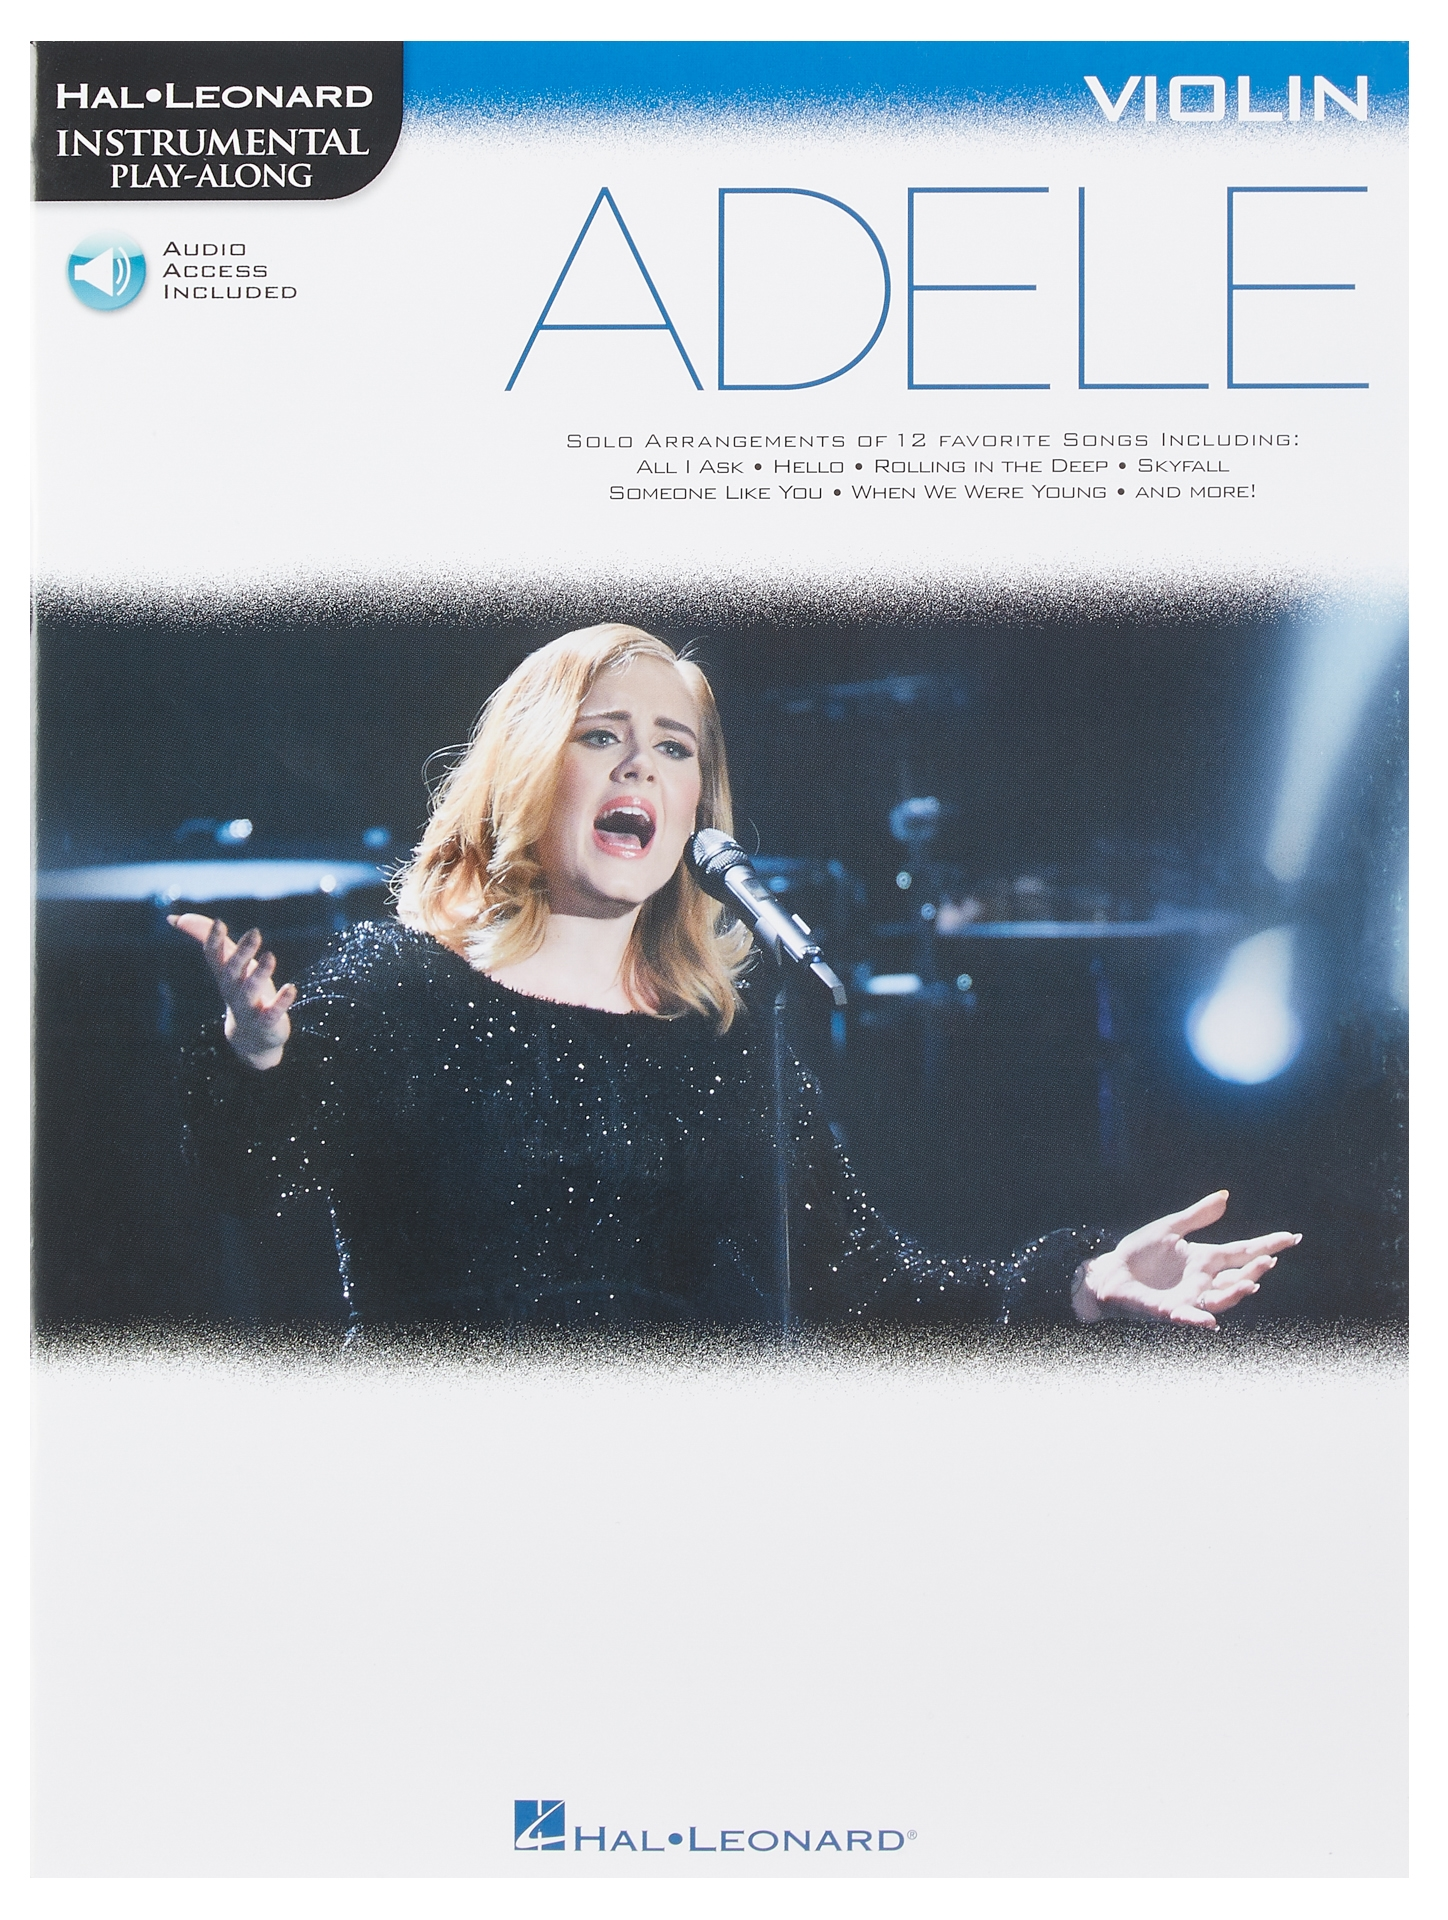 MS Hal Leonard Instrumental Play-Along: Adele - Violin